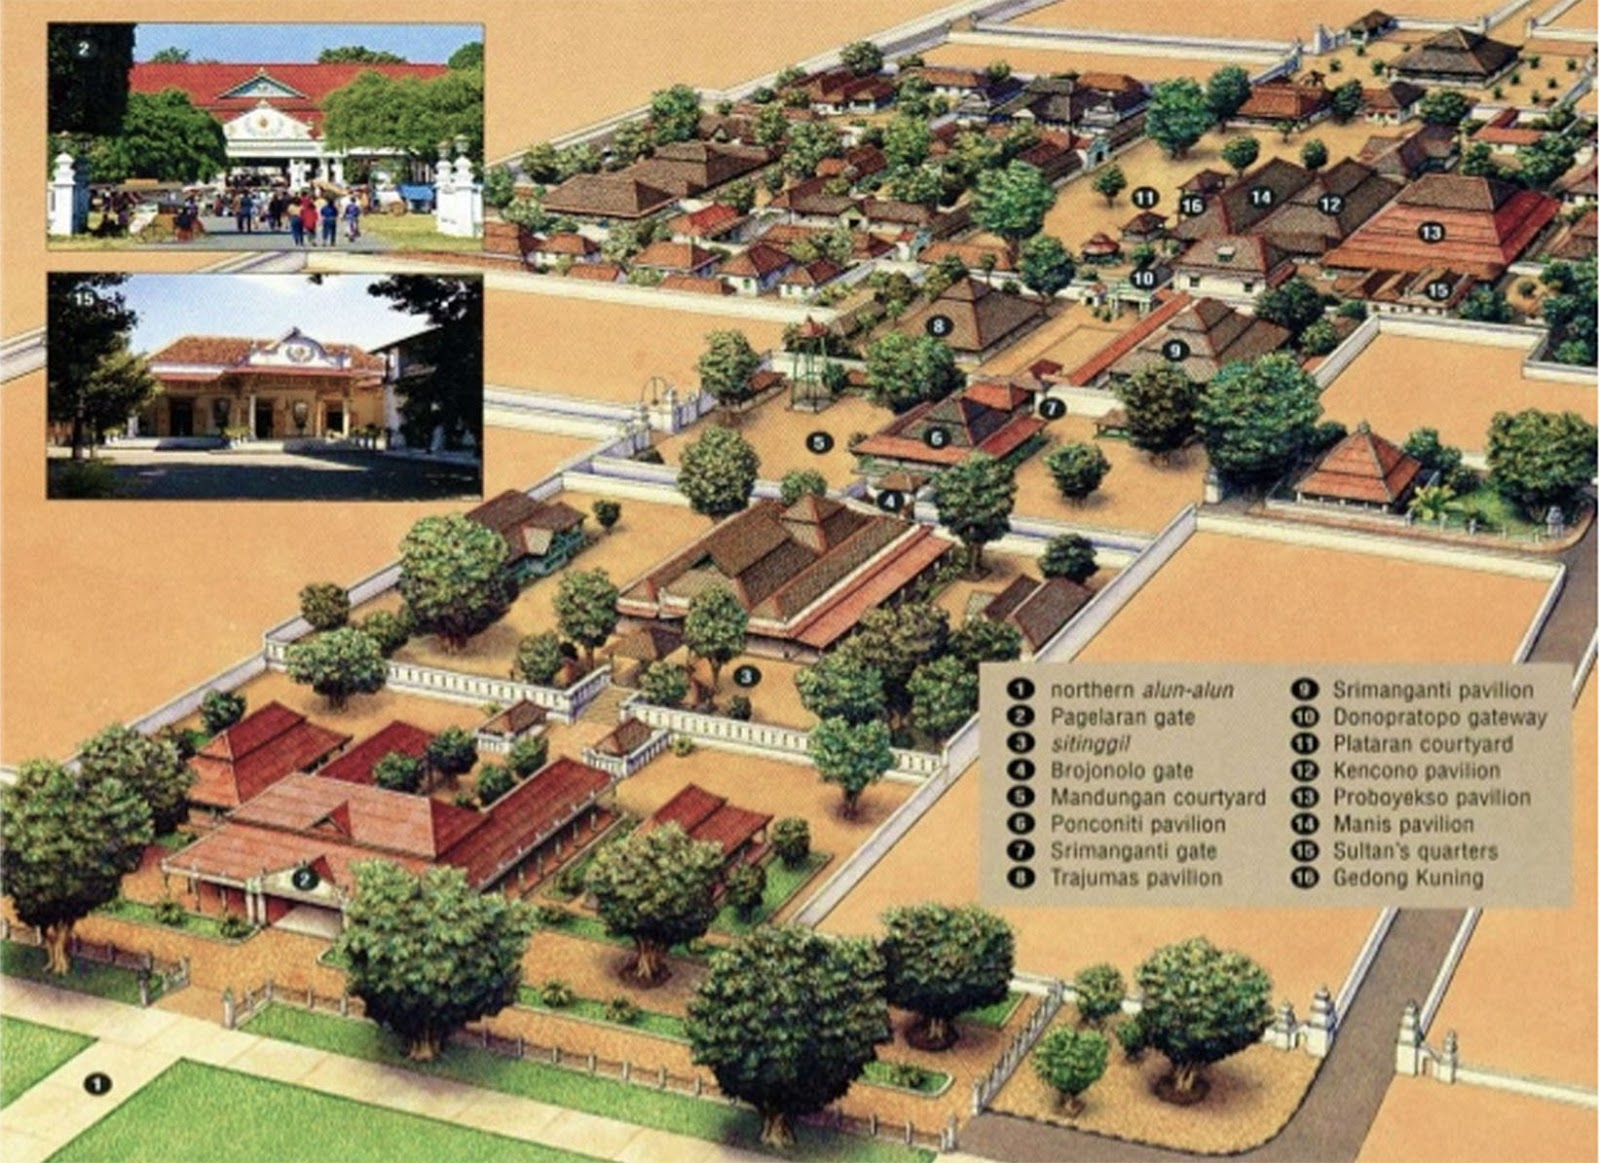 Kompleks Keraton Jogjakarta Destinasi Wisata Domestik Denah Yogyakarta Kota